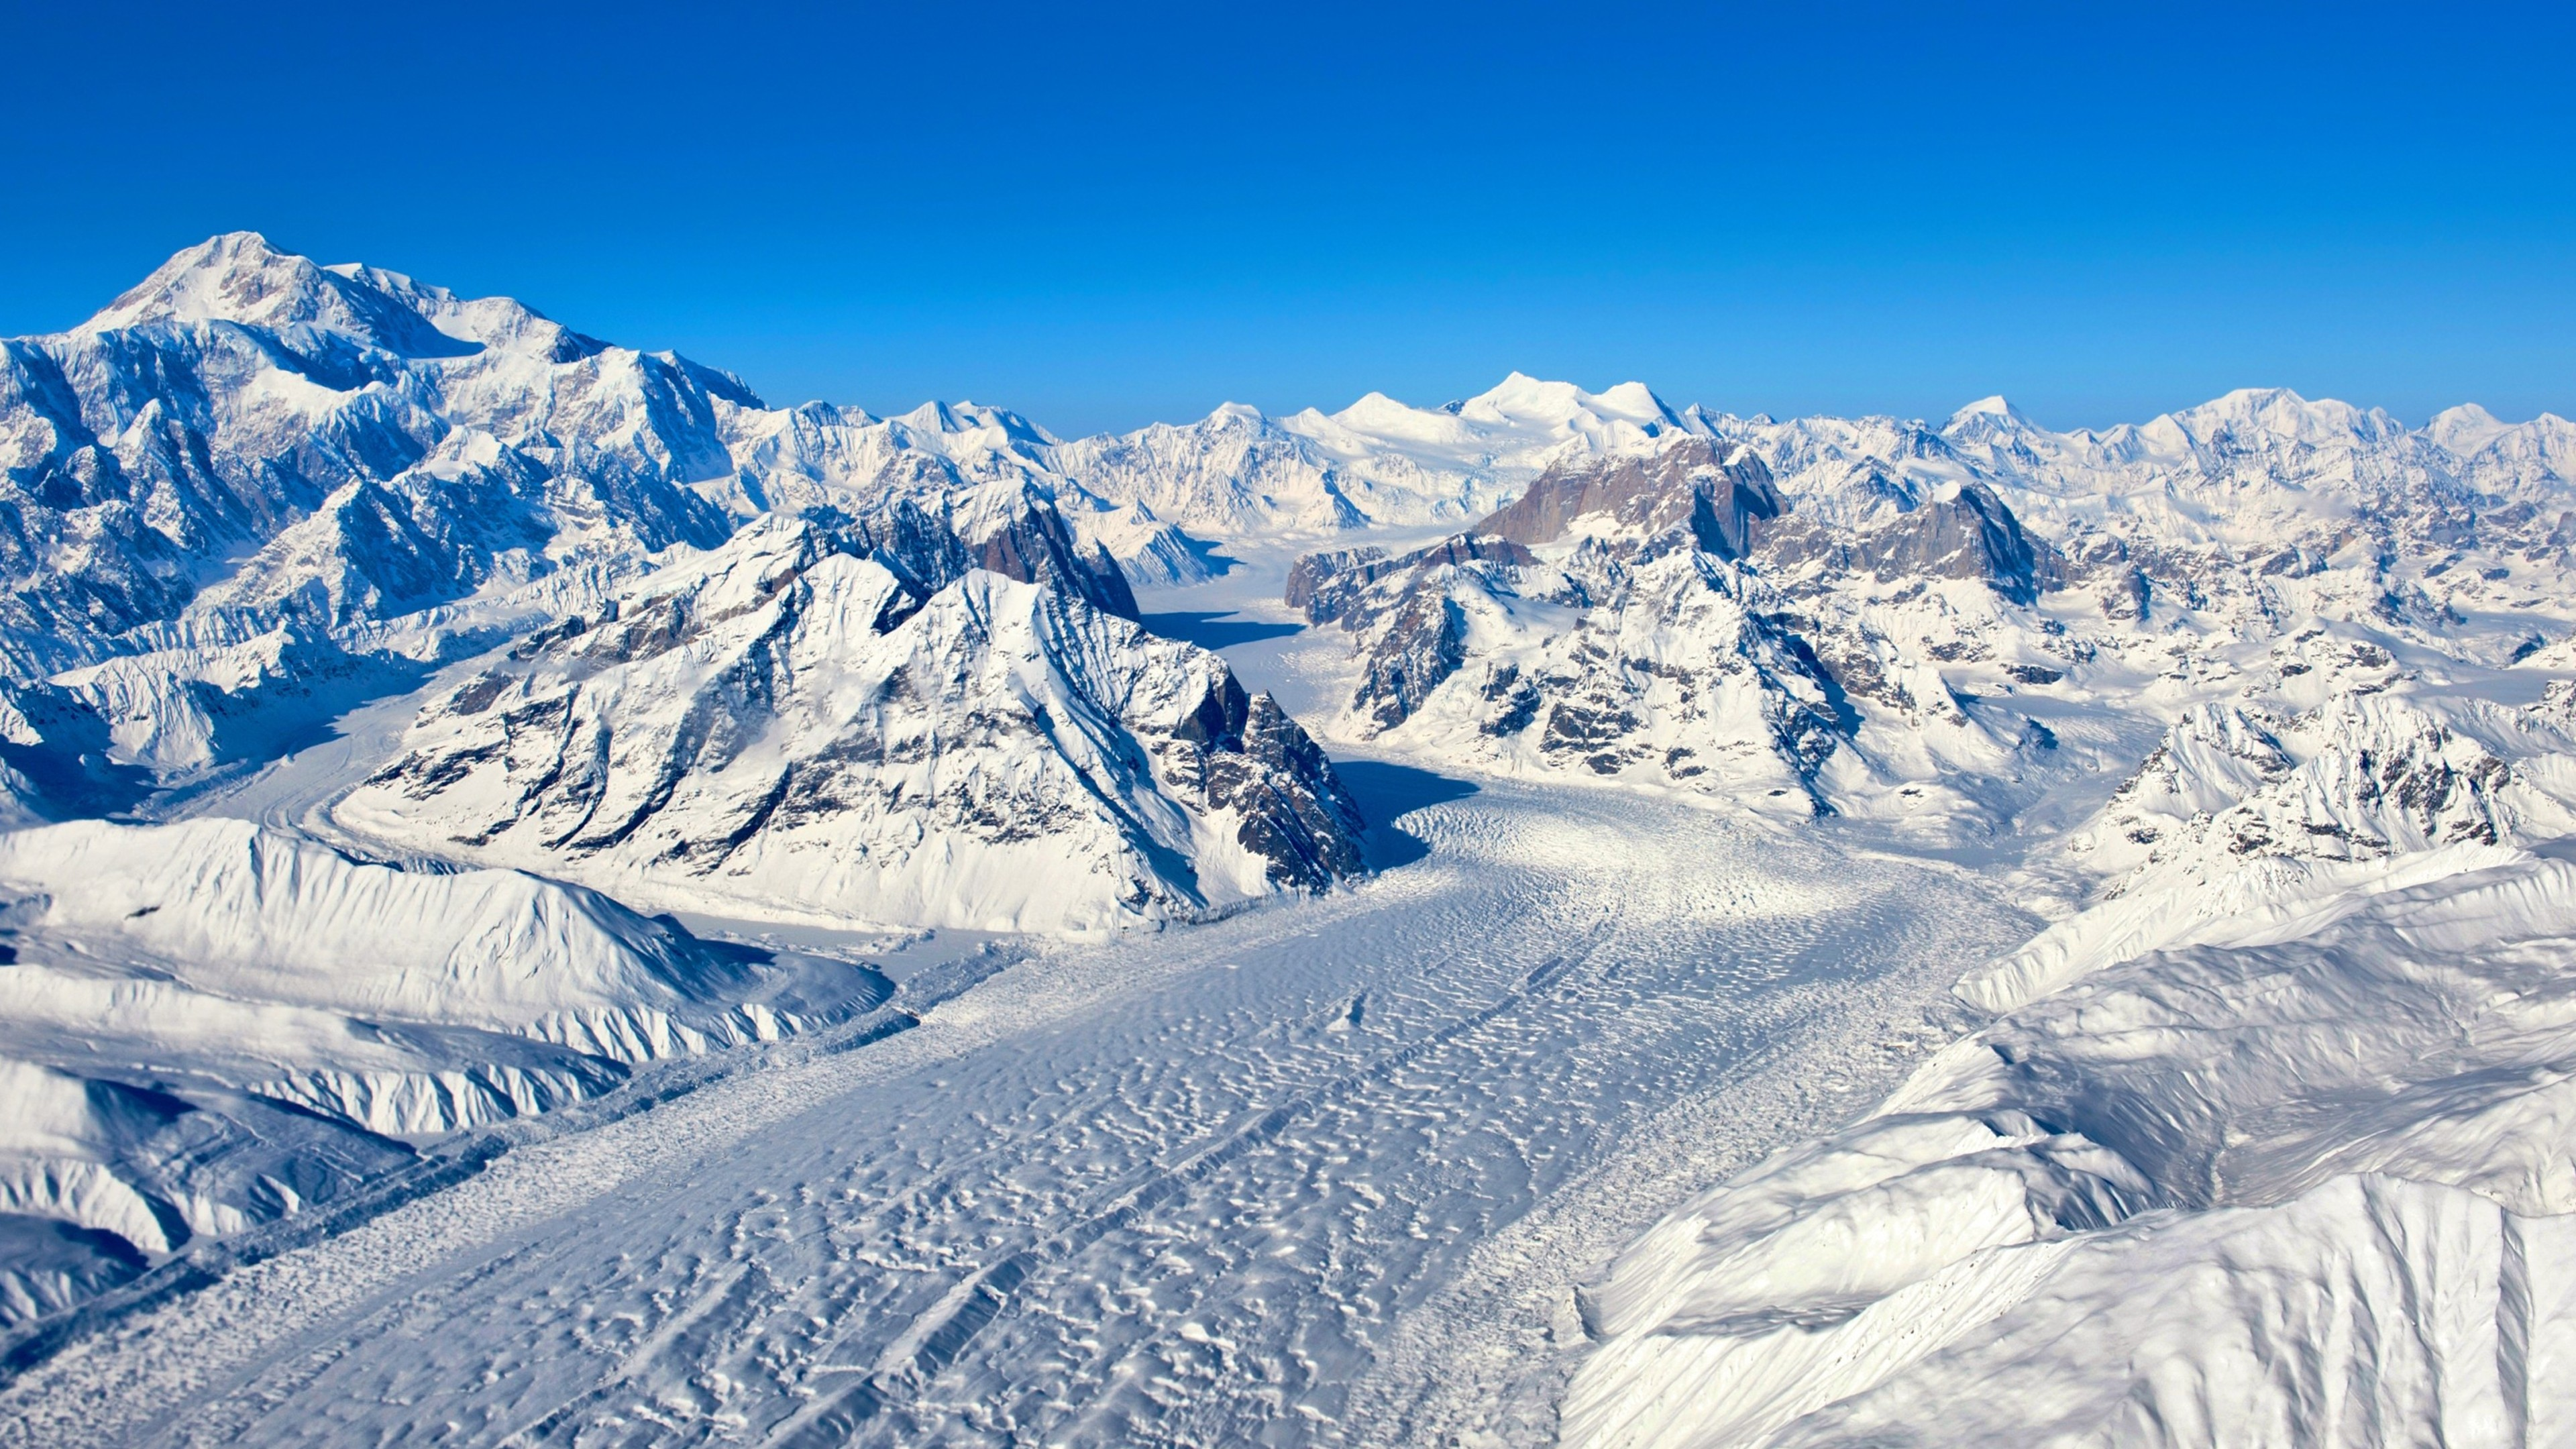 Wallpaper Snowy mountains